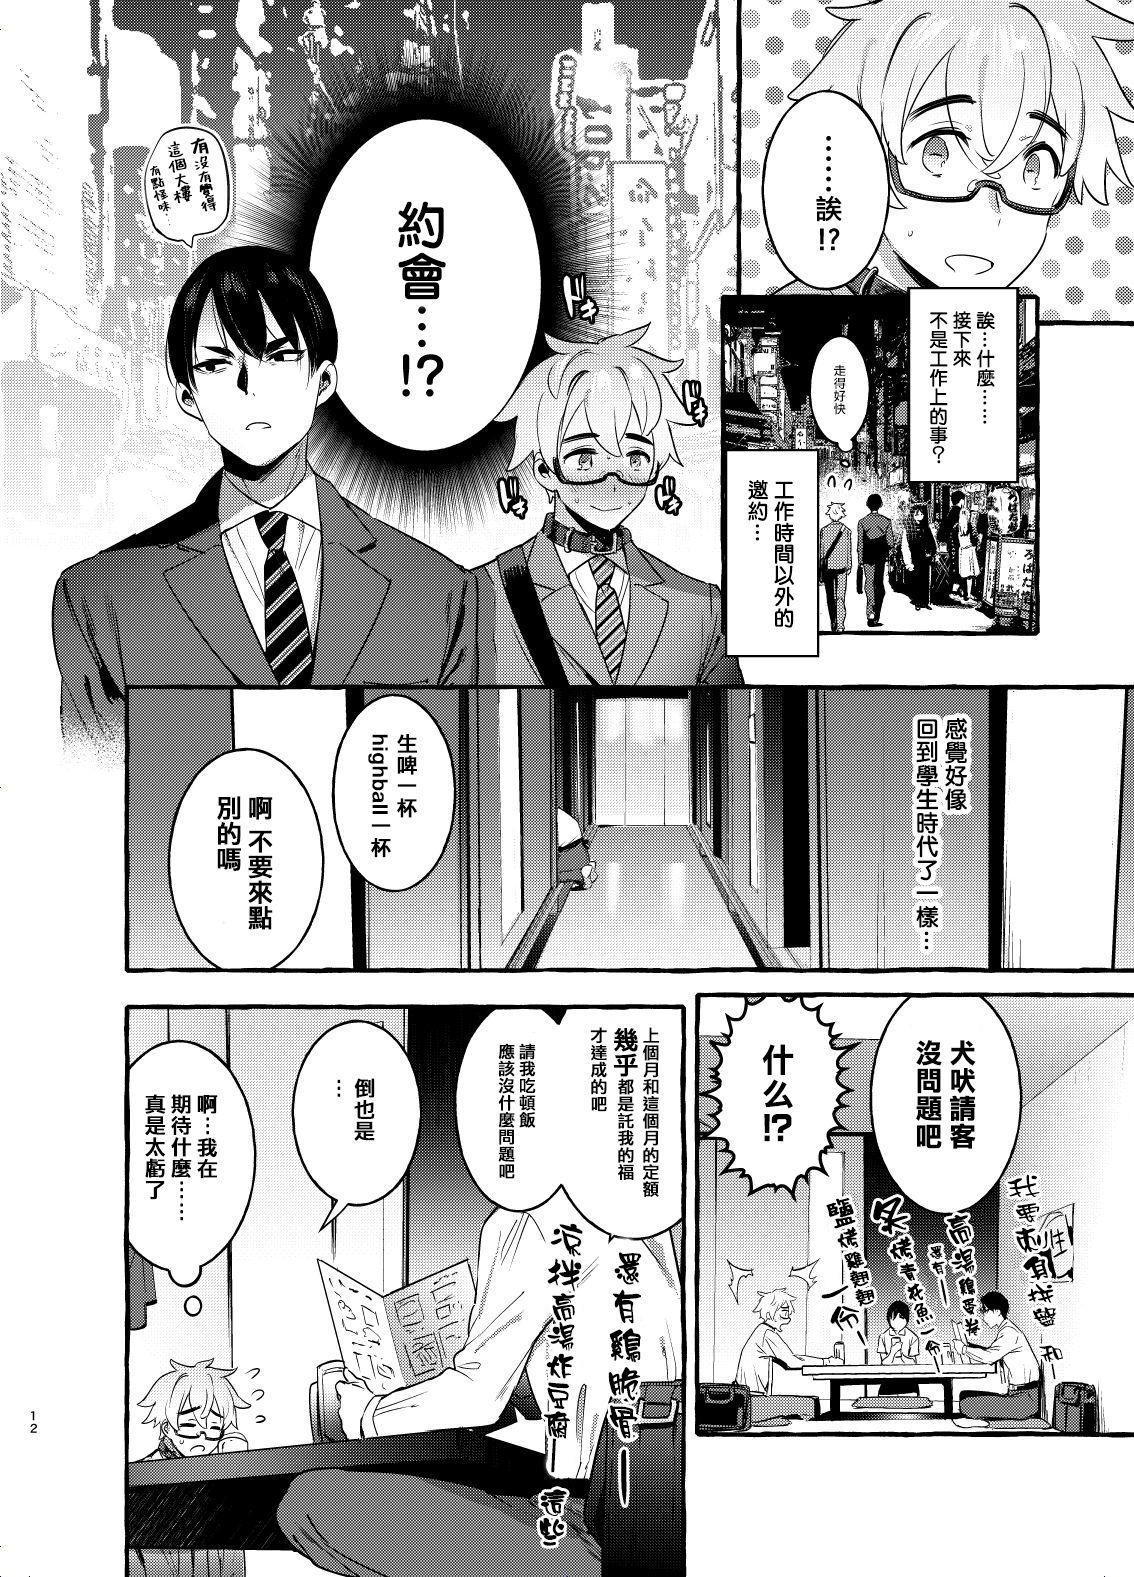 [Otosan no Kurorekishi (Maemukina Do M)]  Wanwan Otou-san   犬系爸爸 01-02 [Chinese] [拾荒者汉化组] [Digital] 52